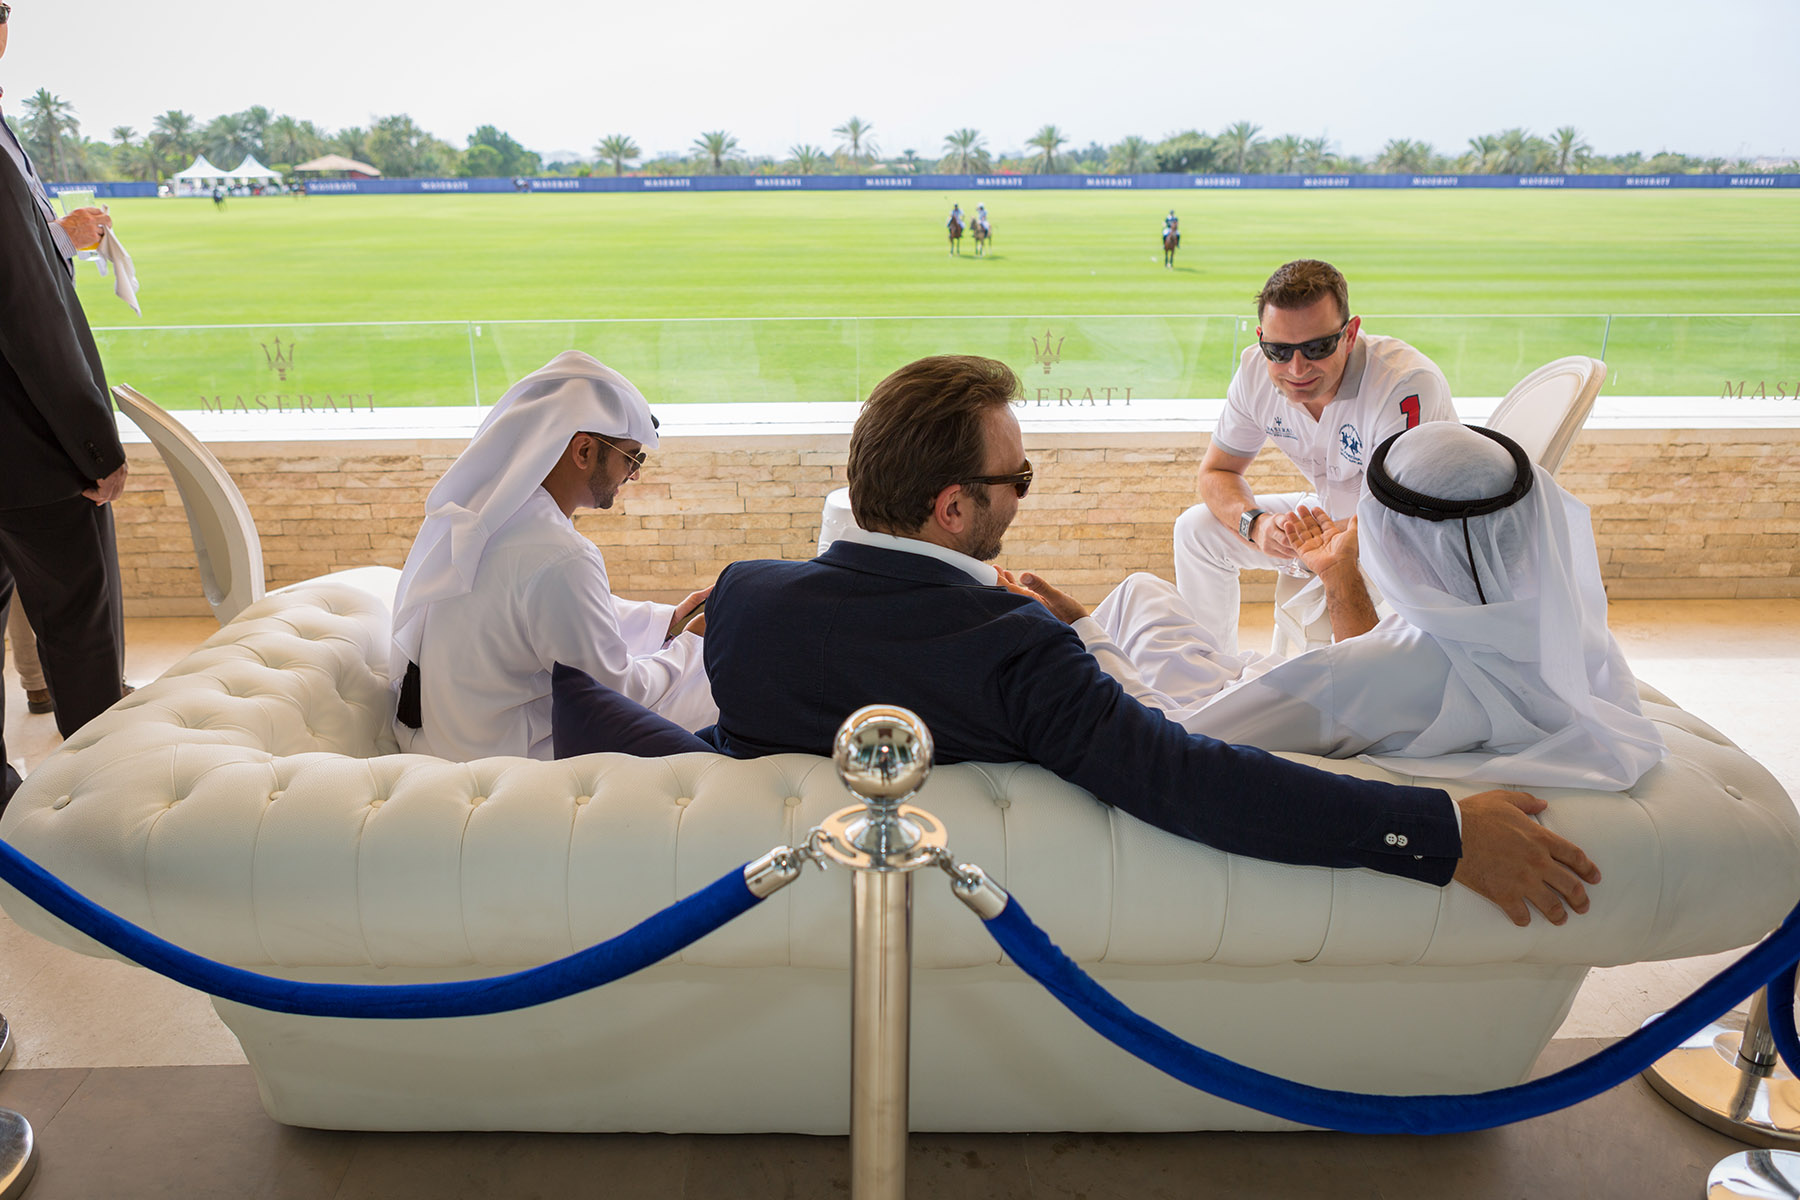 Maserati's CEO enjoying the polo match event by Loesje Kessels Fashion Photographer Dubai